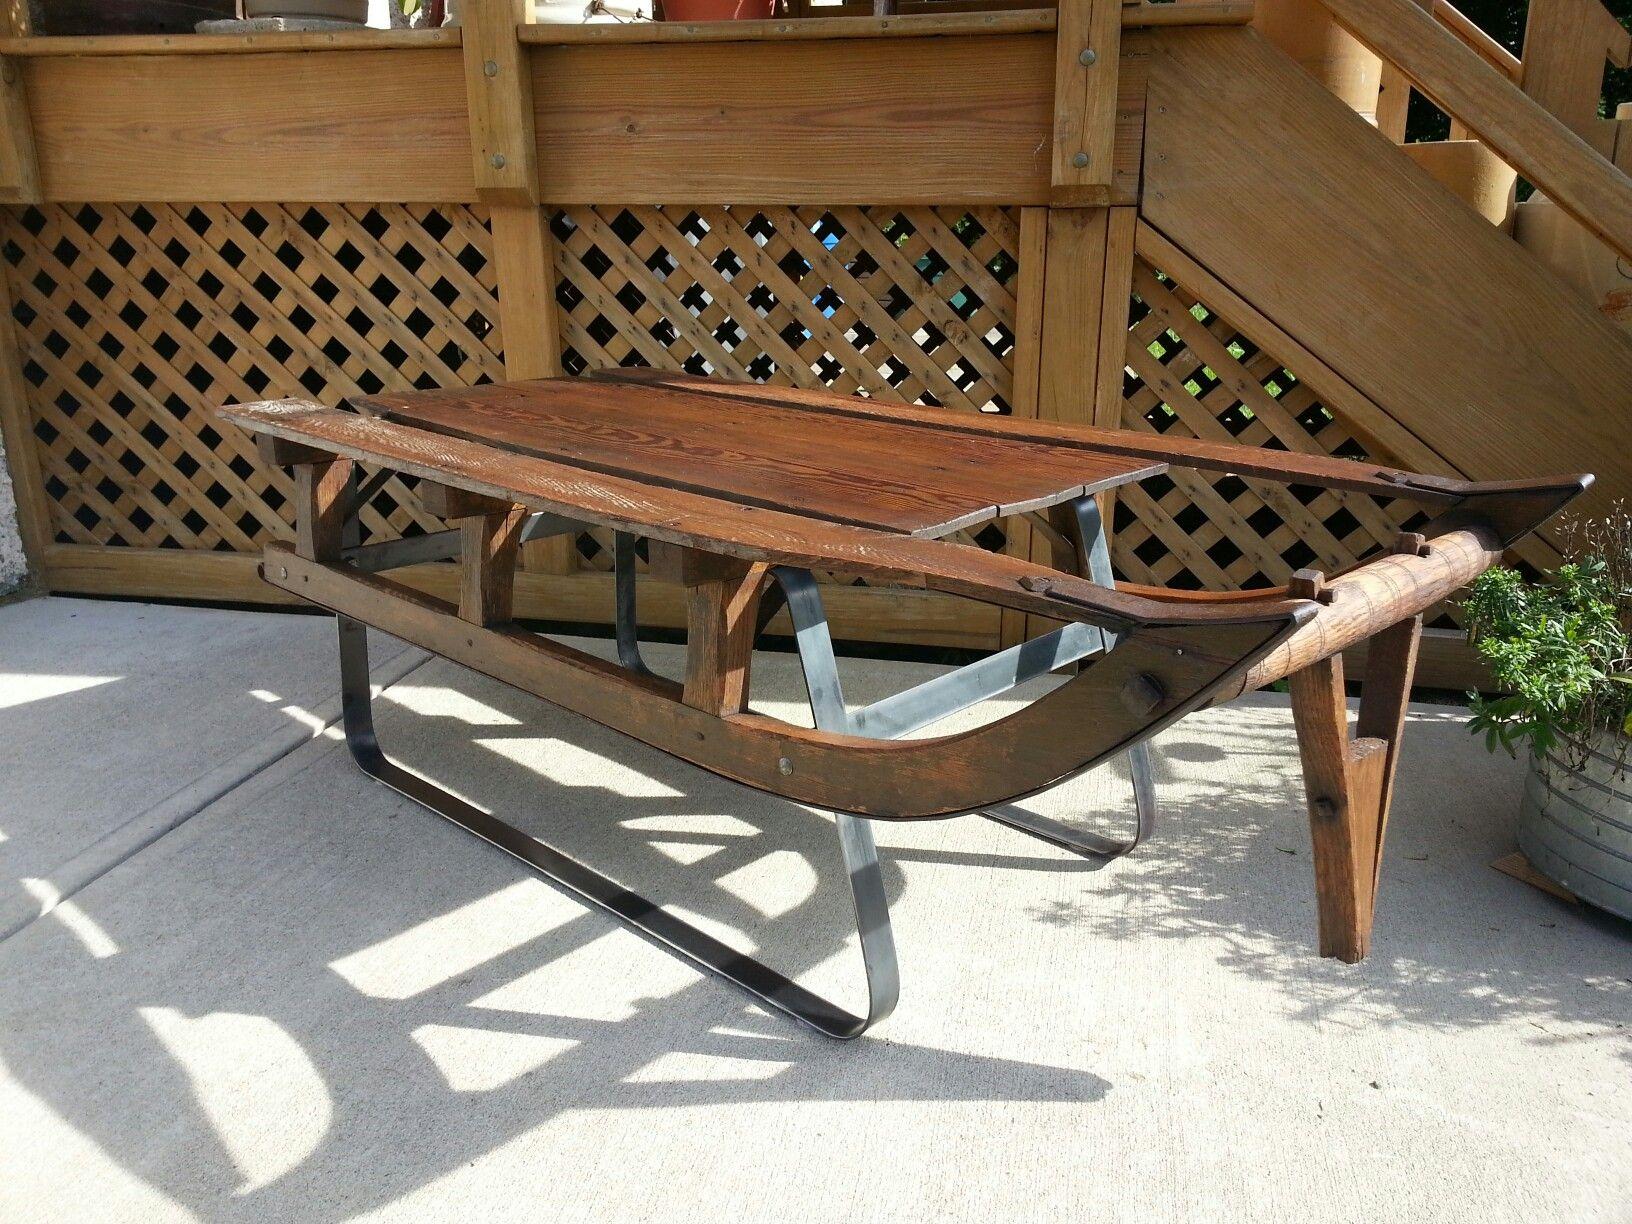 Vintage Pony Sled Coffee Table Signature ReFind Salvage